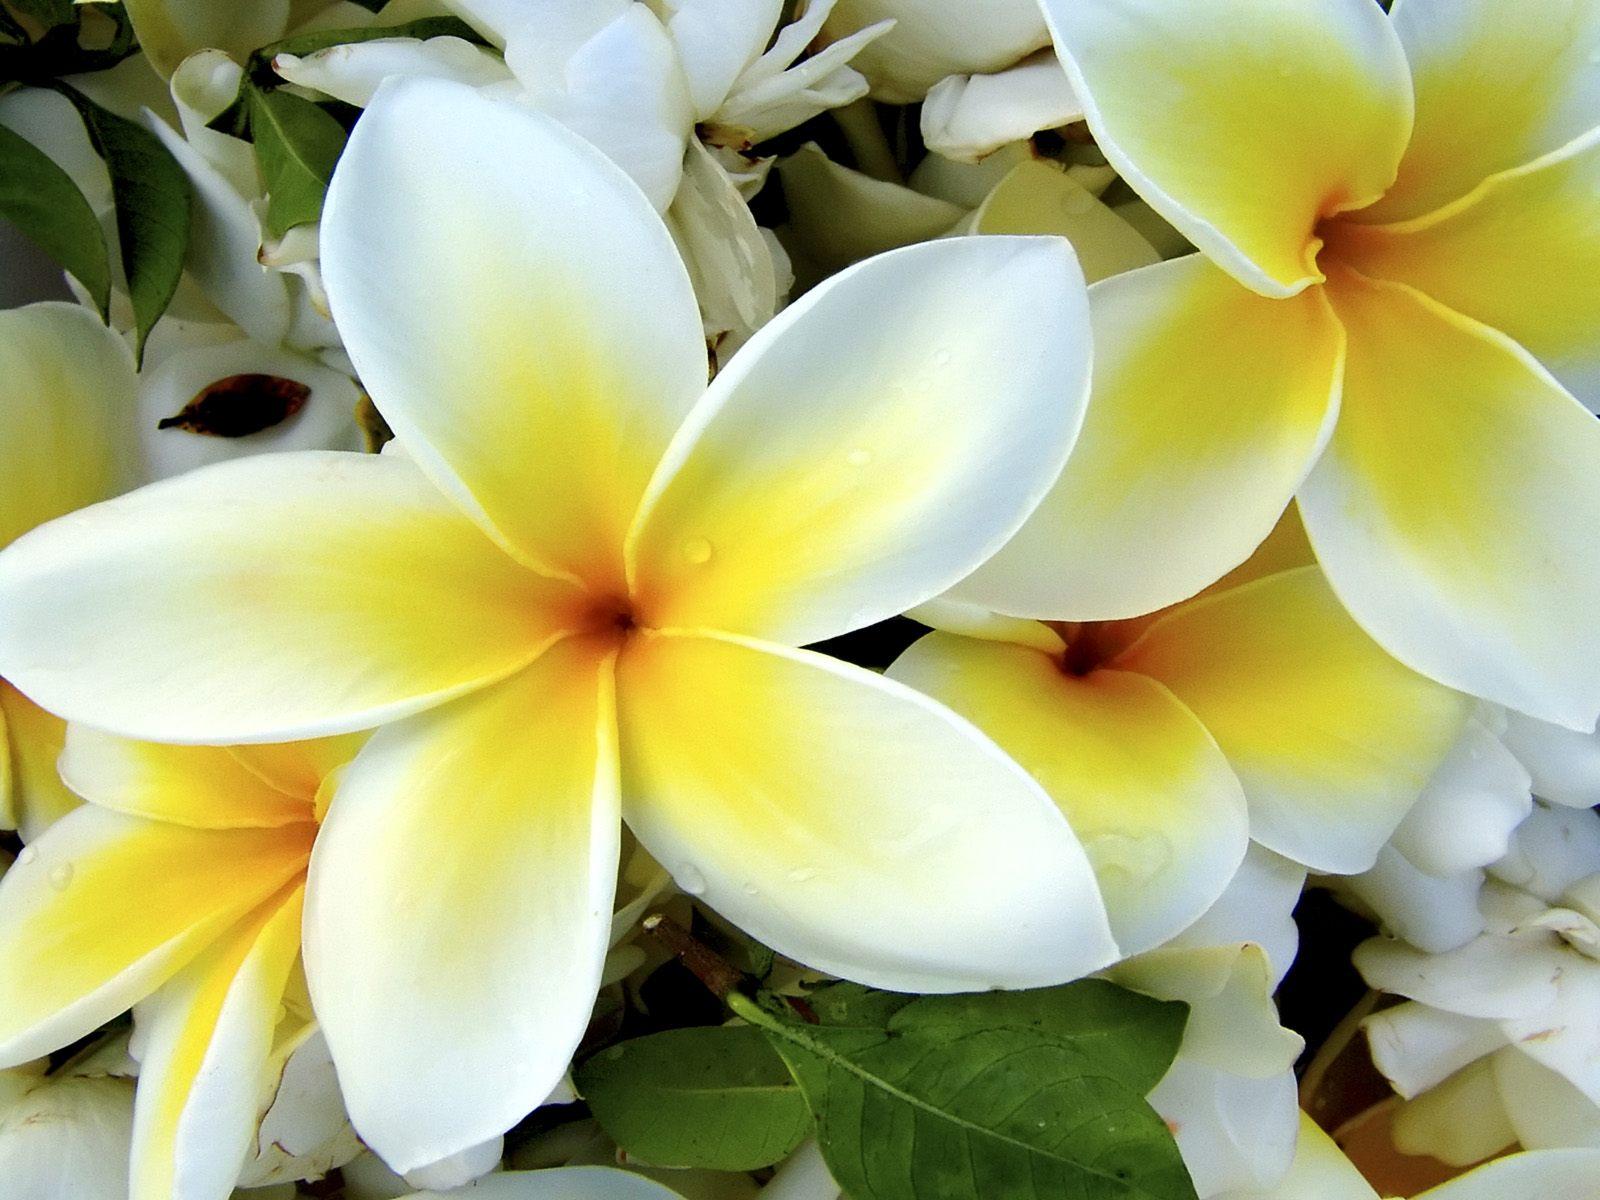 Hawaiian Flowers Wallpaper Backgrounds WallpaperSafari